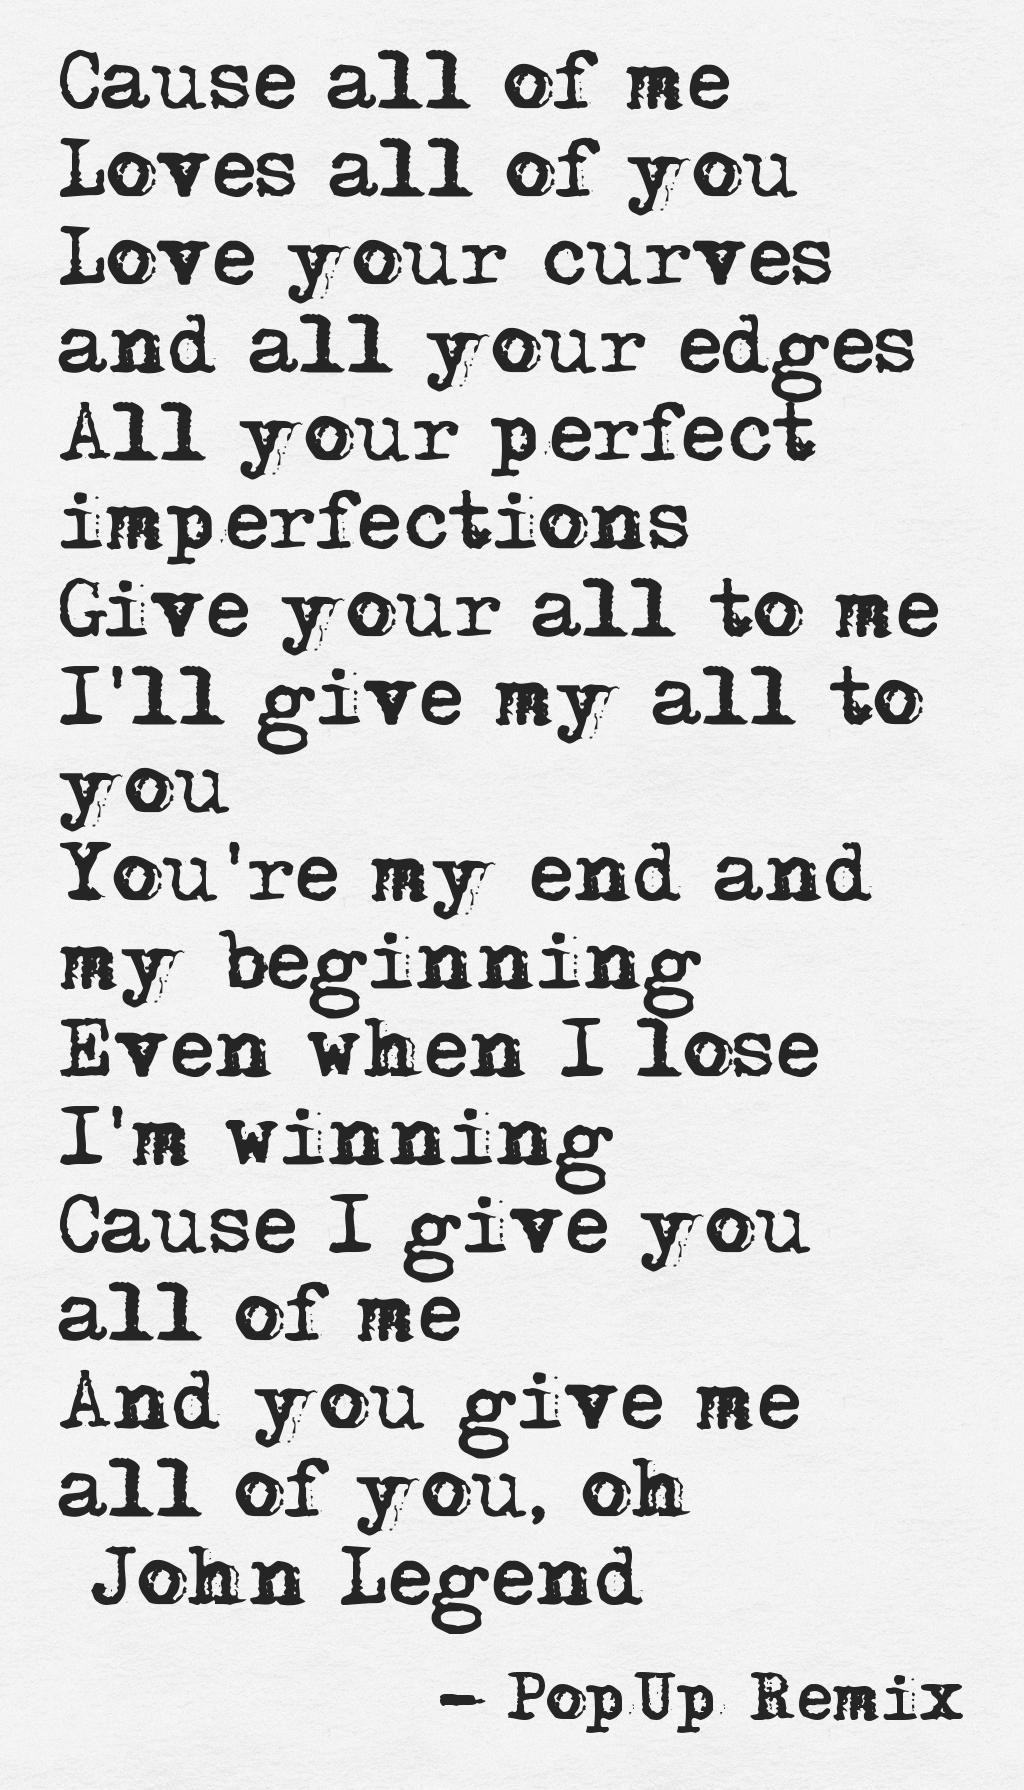 geico commercial karaoke dating lyrics